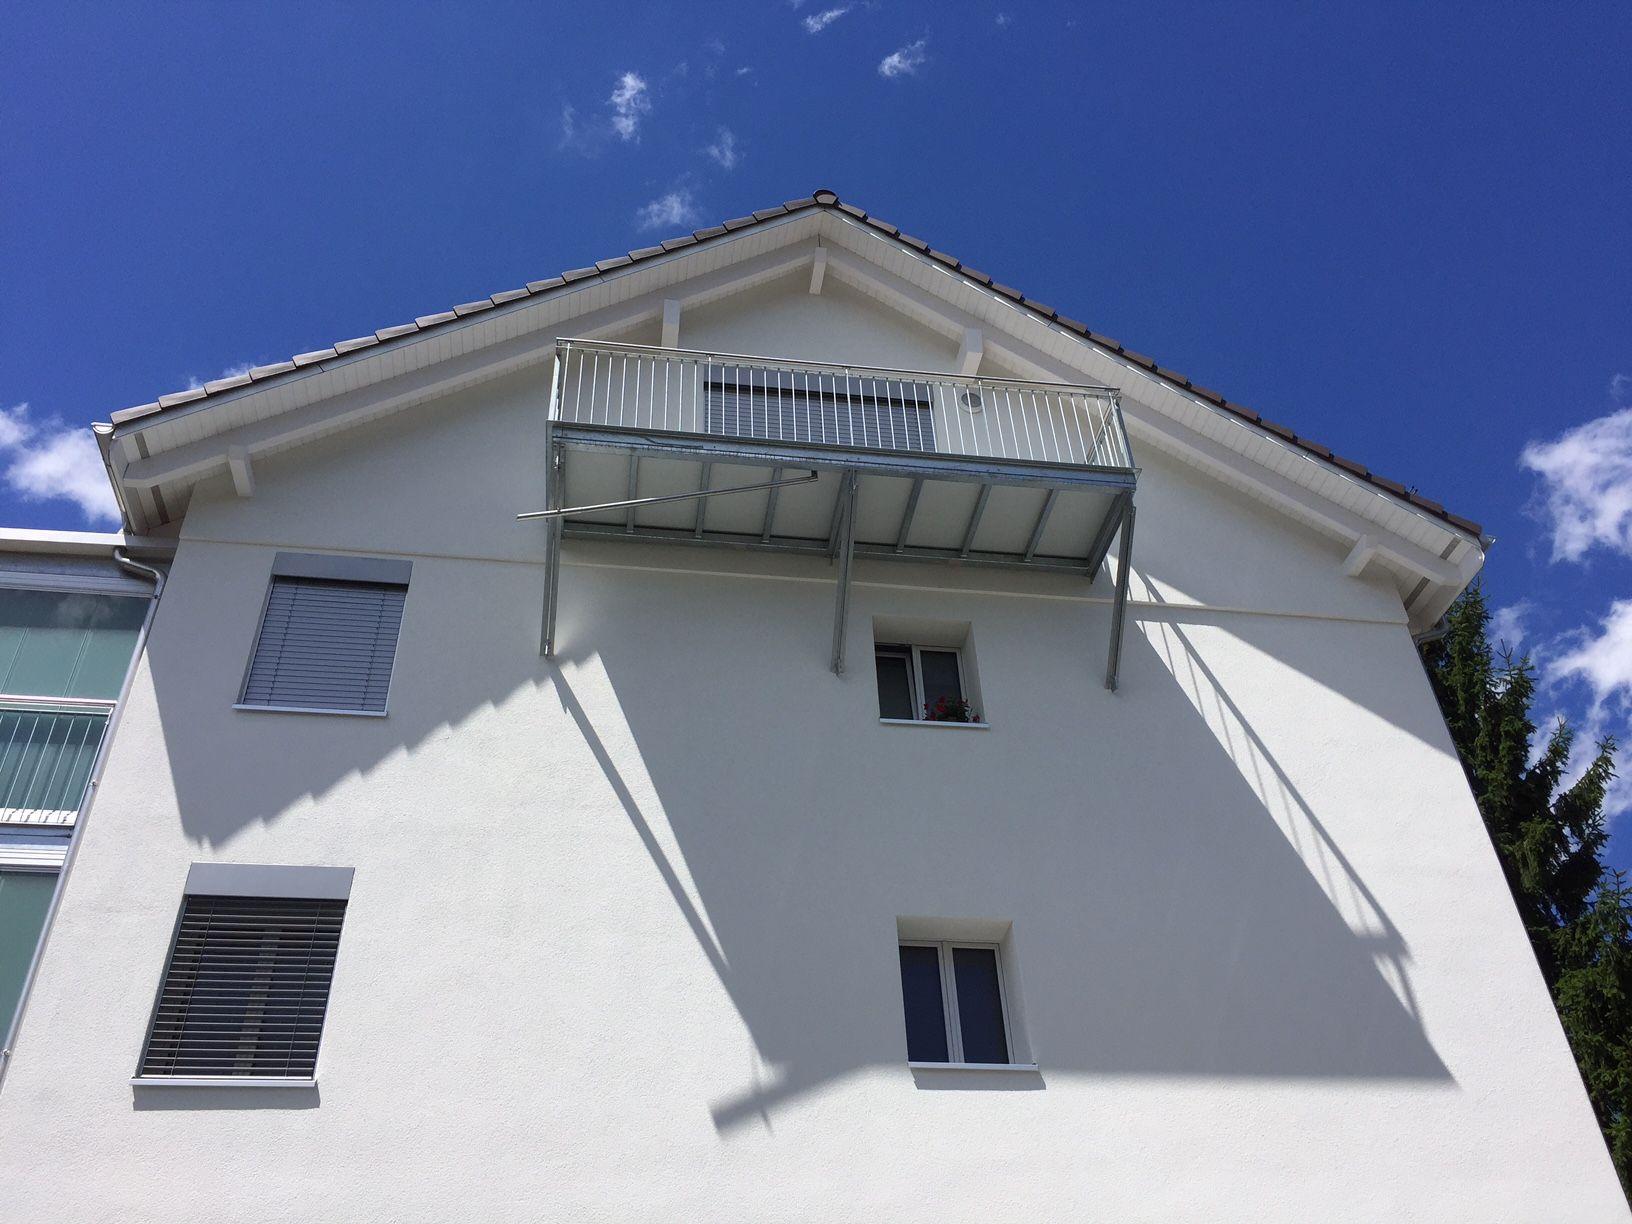 Balkonbodenplatte